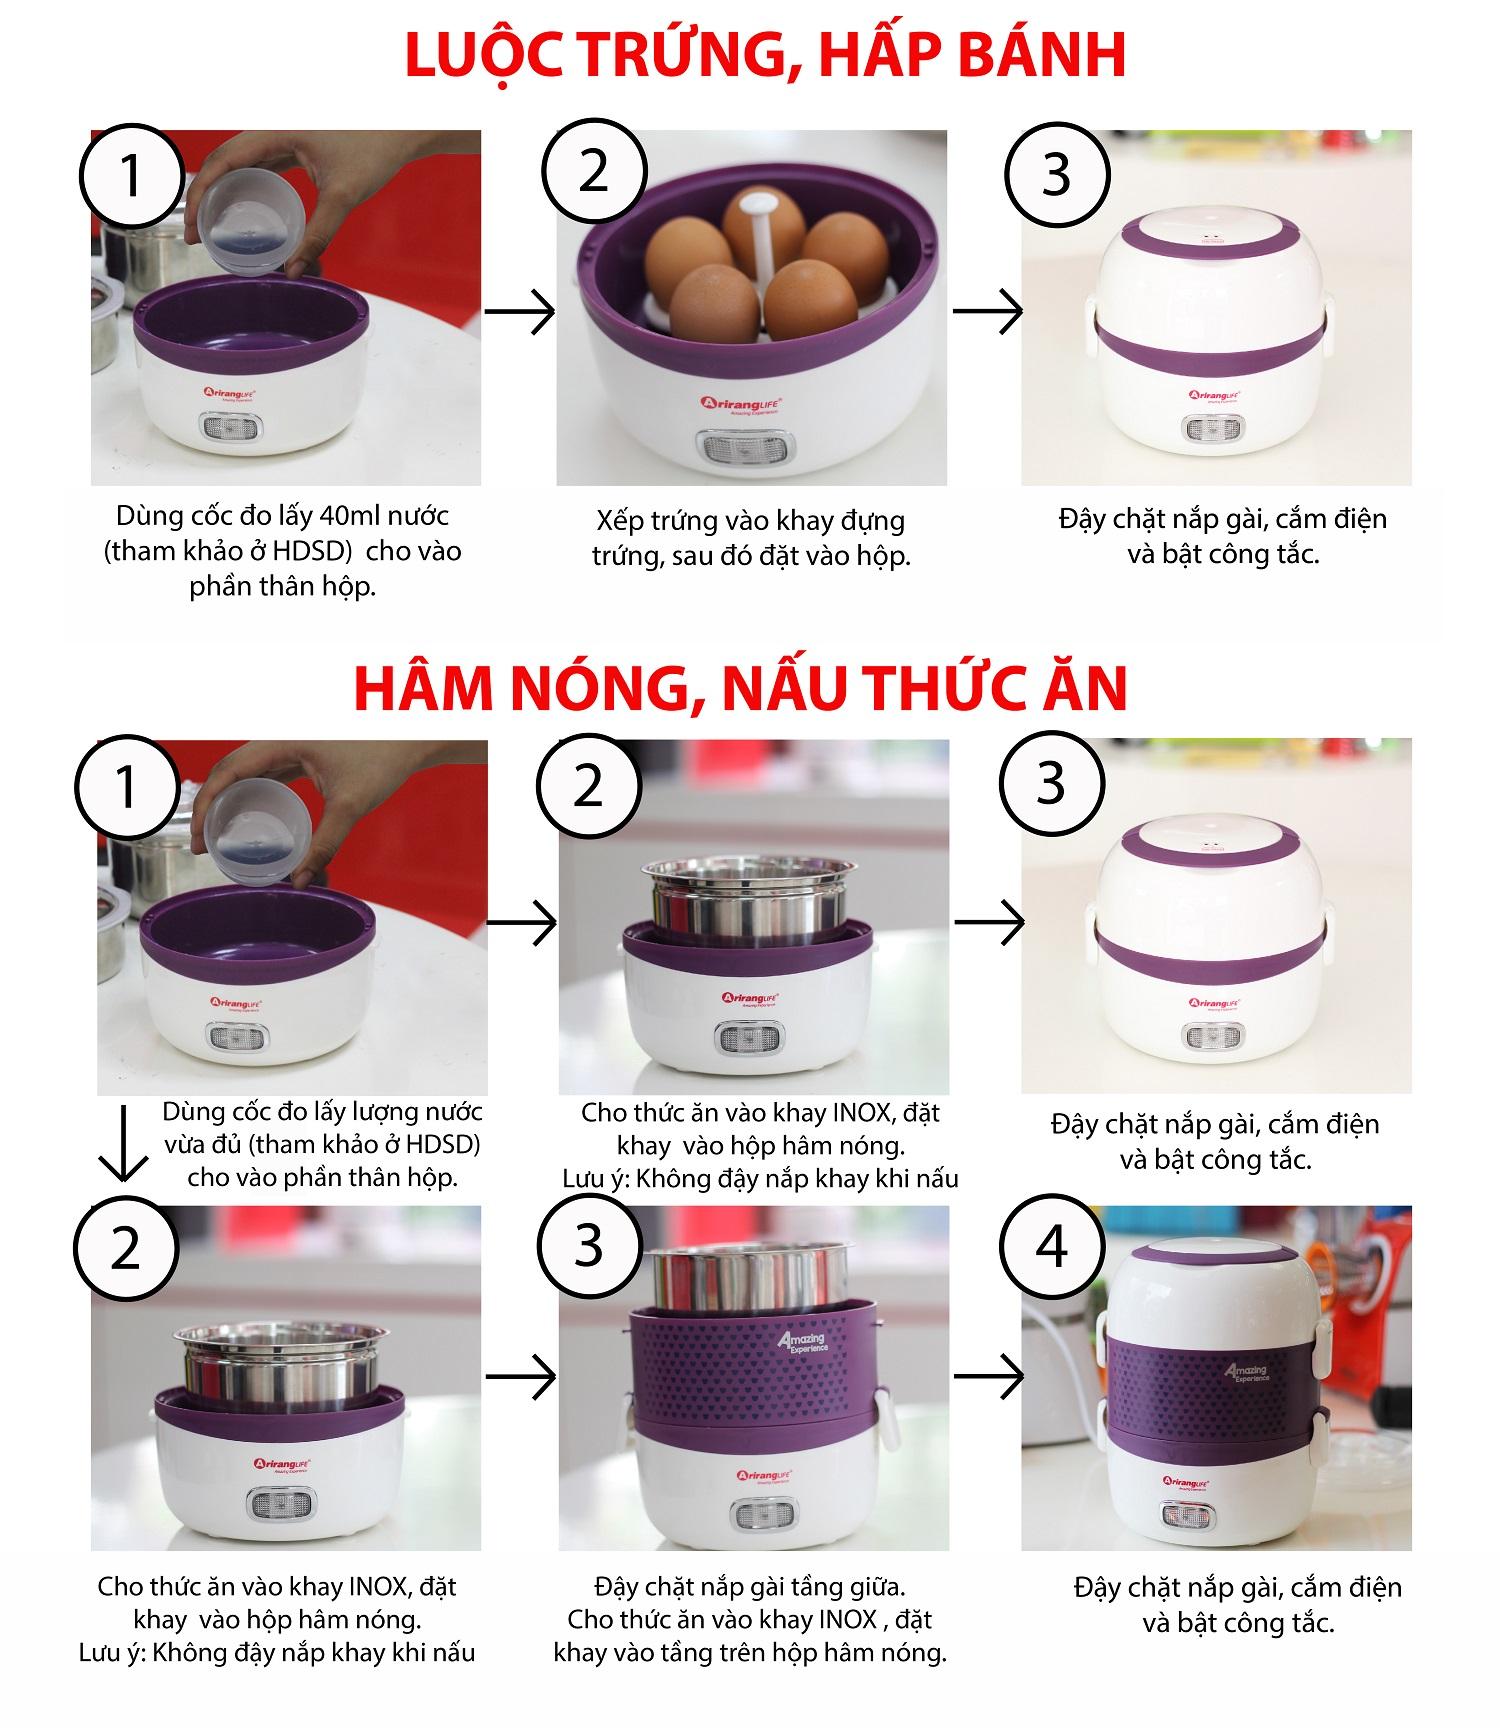 https://tikicdn.com/media/catalog/product/h/i/hinh_10_-_cach_su_dung_hop_ham_nong_ariranglife_2.jpg